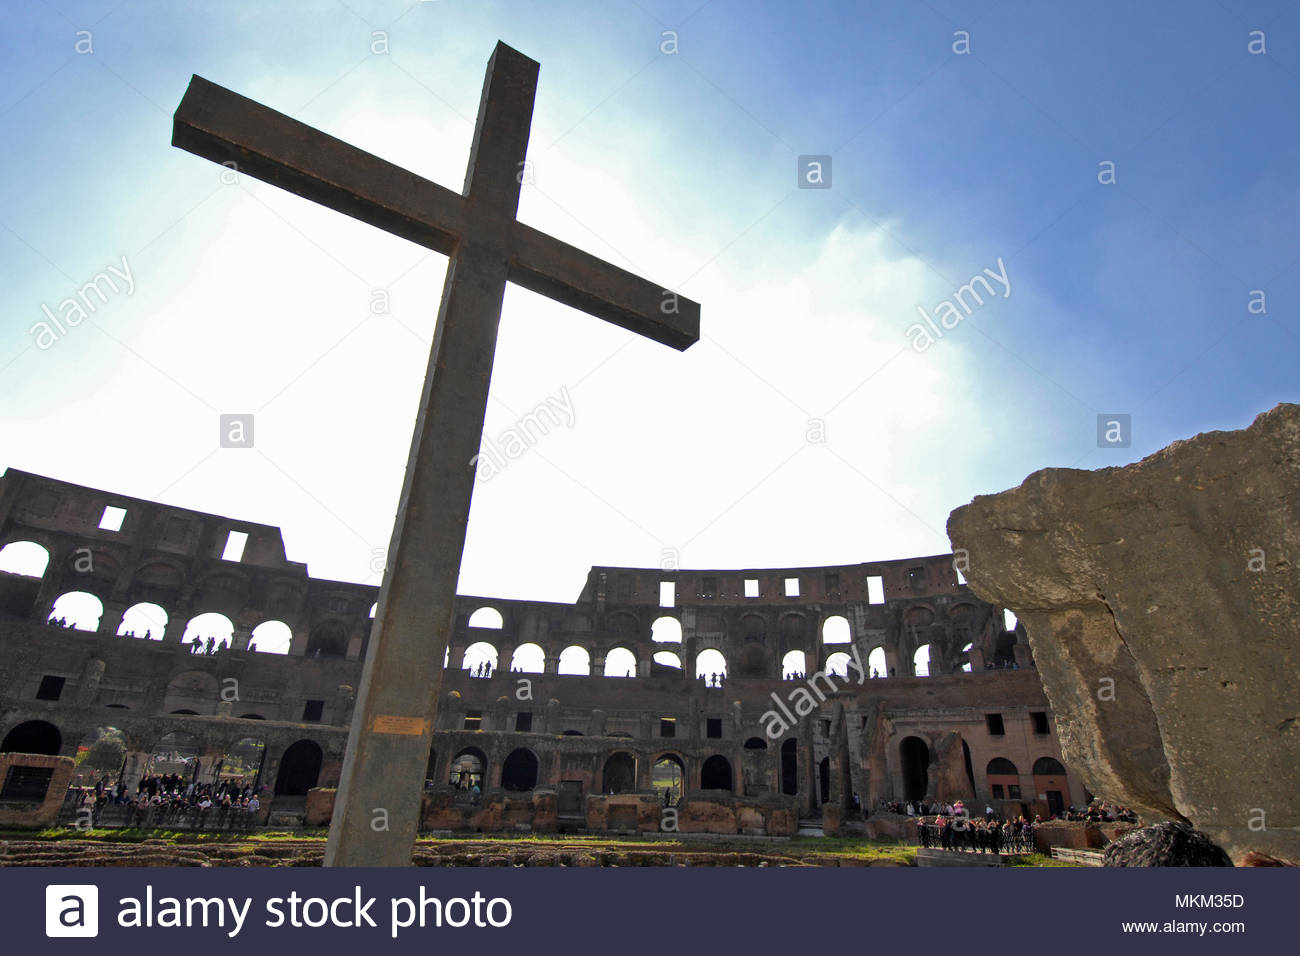 holy cross in the colosseum, Rome, Lazio, Italy, Europe / Rome | Heiliges Kreuz im Kolosseum, Rom Latium, Italien, Europa / Rom Stock Photo